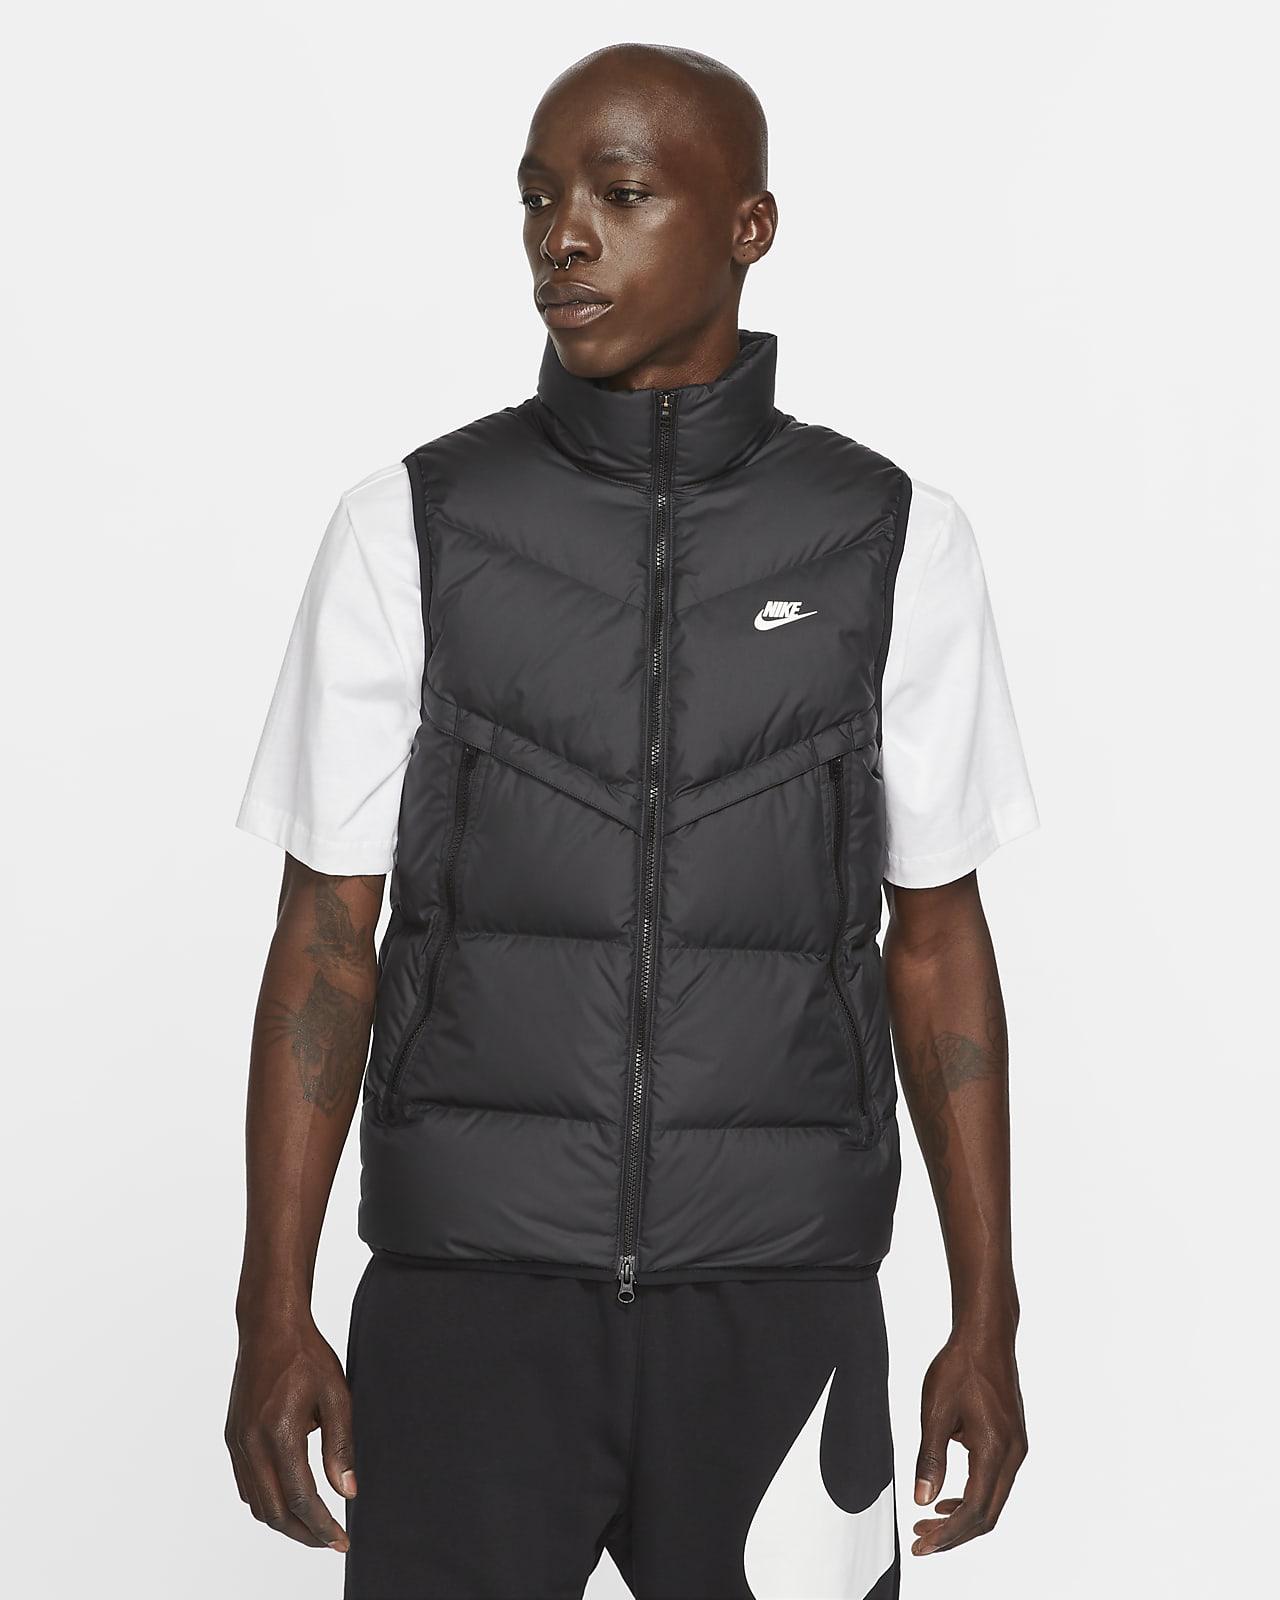 Veste sans manches Nike Sportswear Storm-FIT Windrunner pour Homme